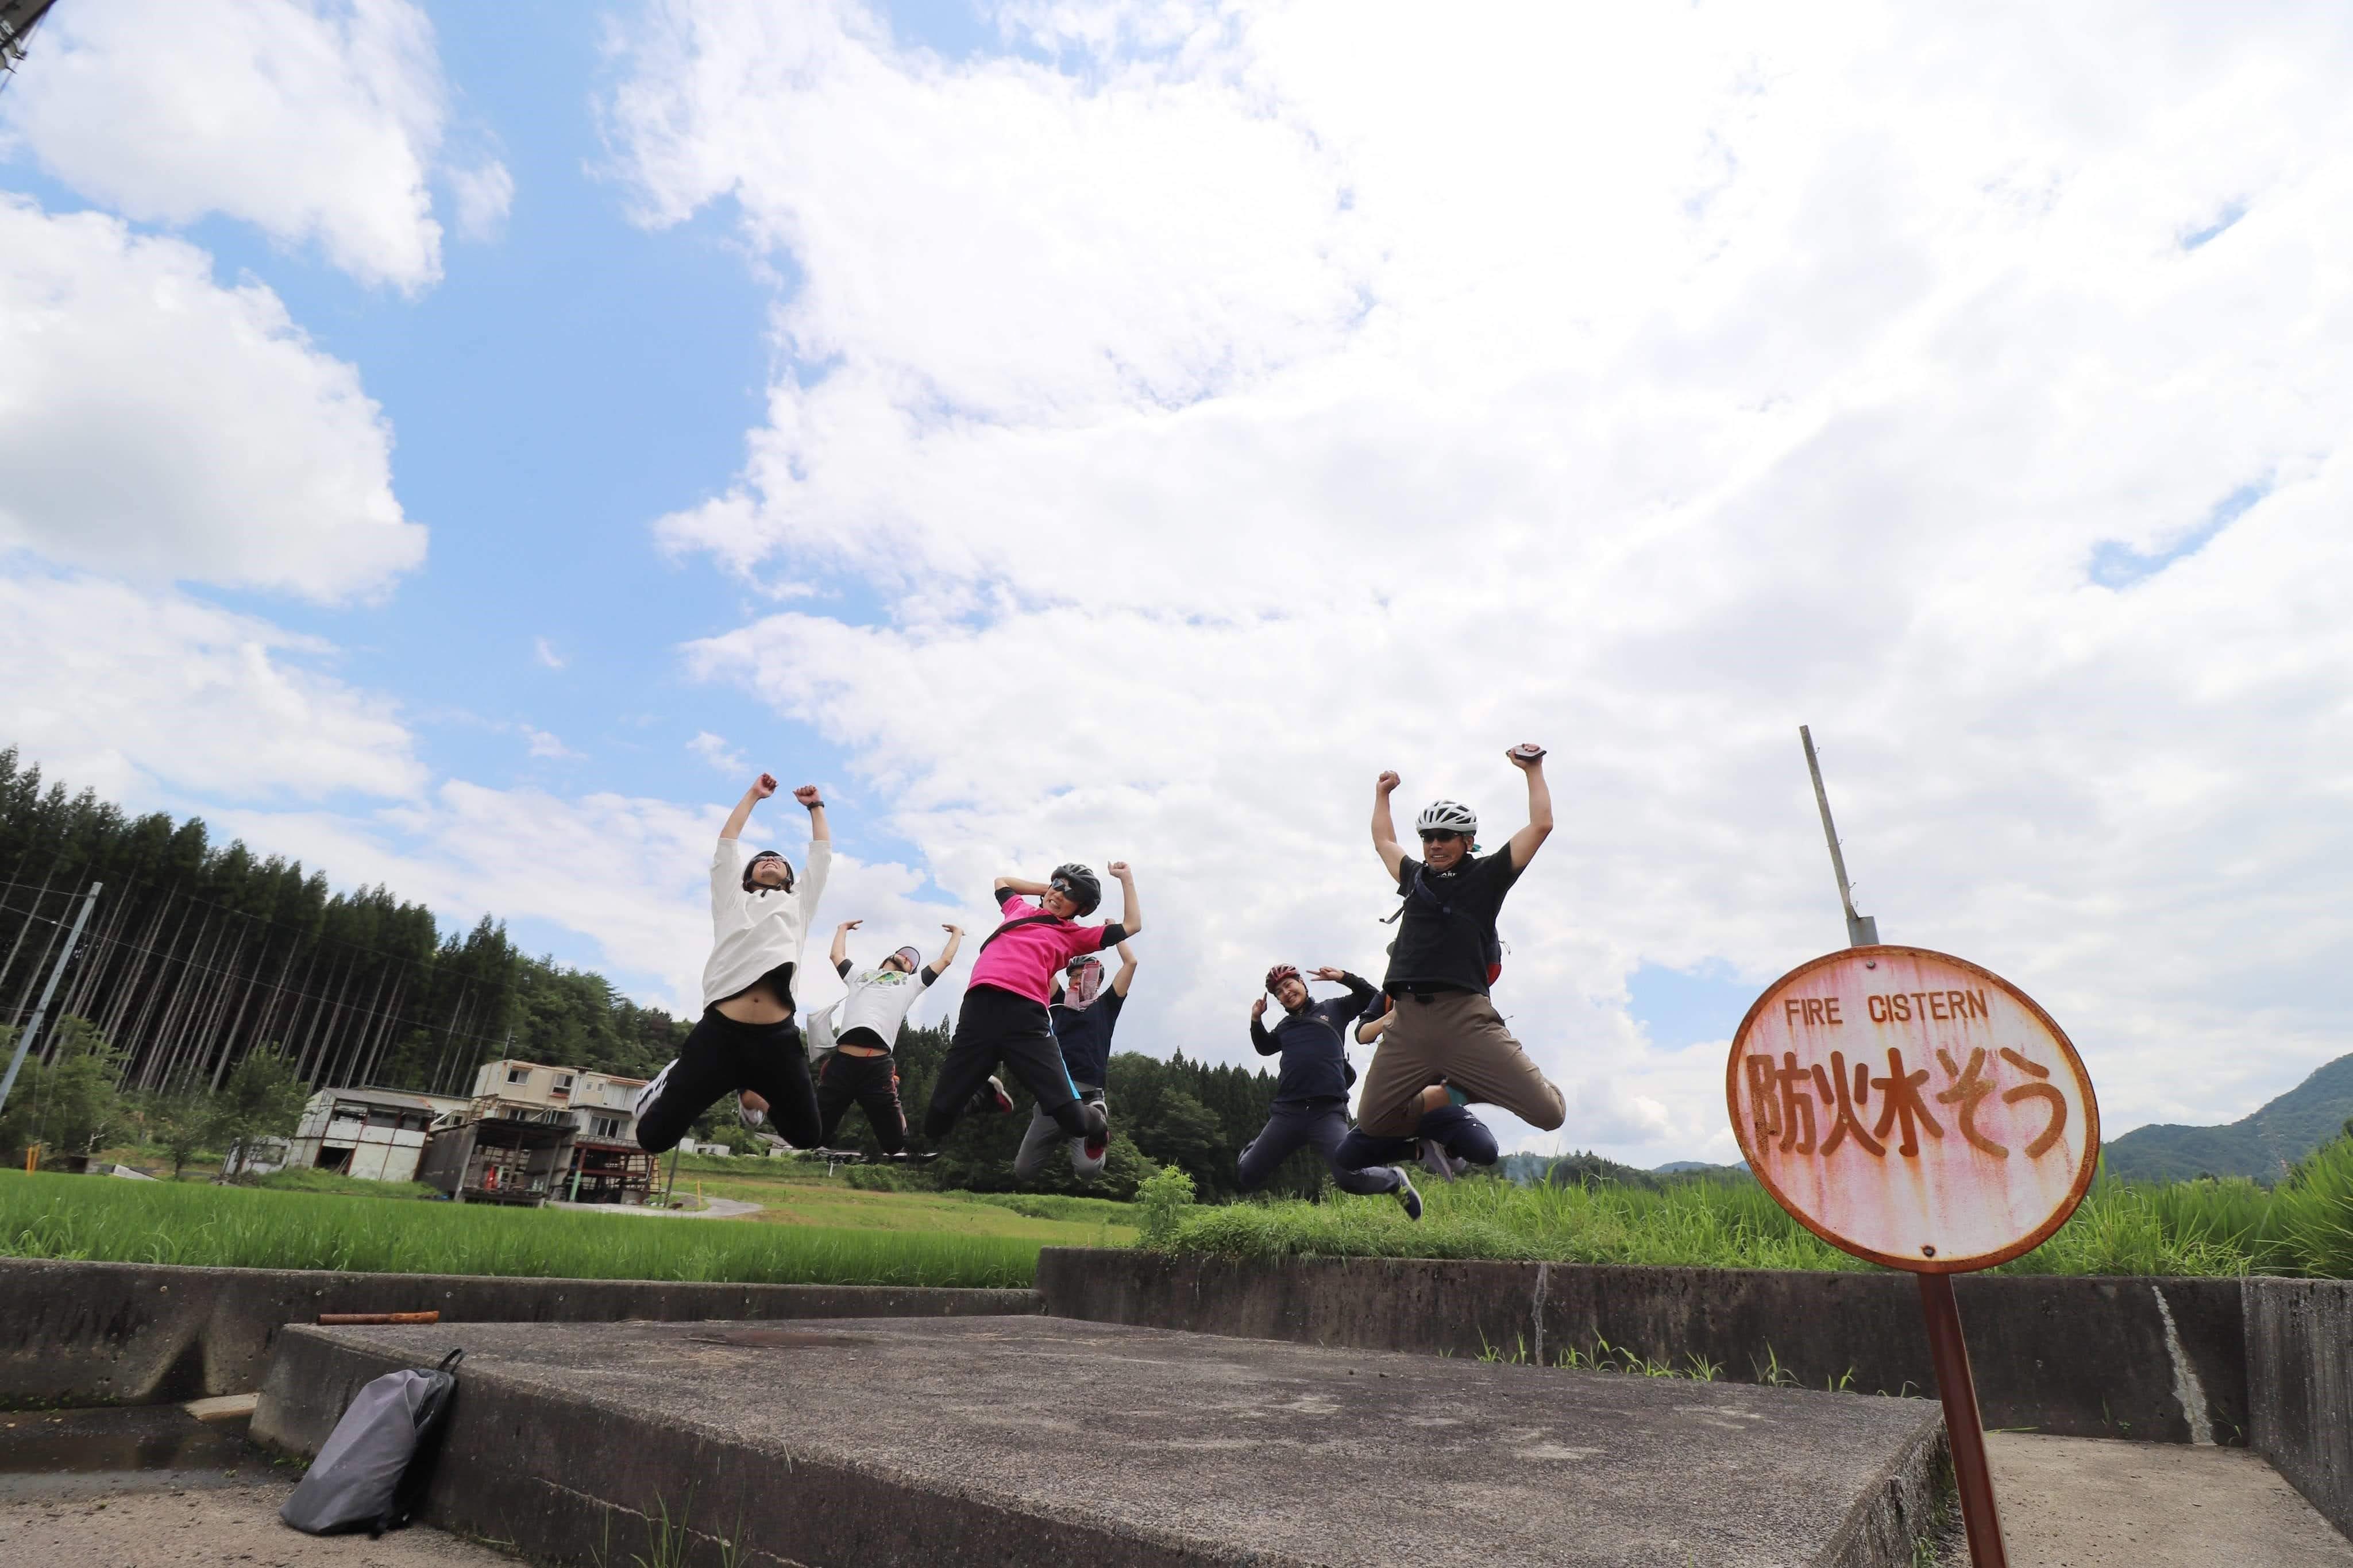 sokoiko!北広島 ~Power of KIZUNA~ /人の絆の力を感じるストーリーツアー